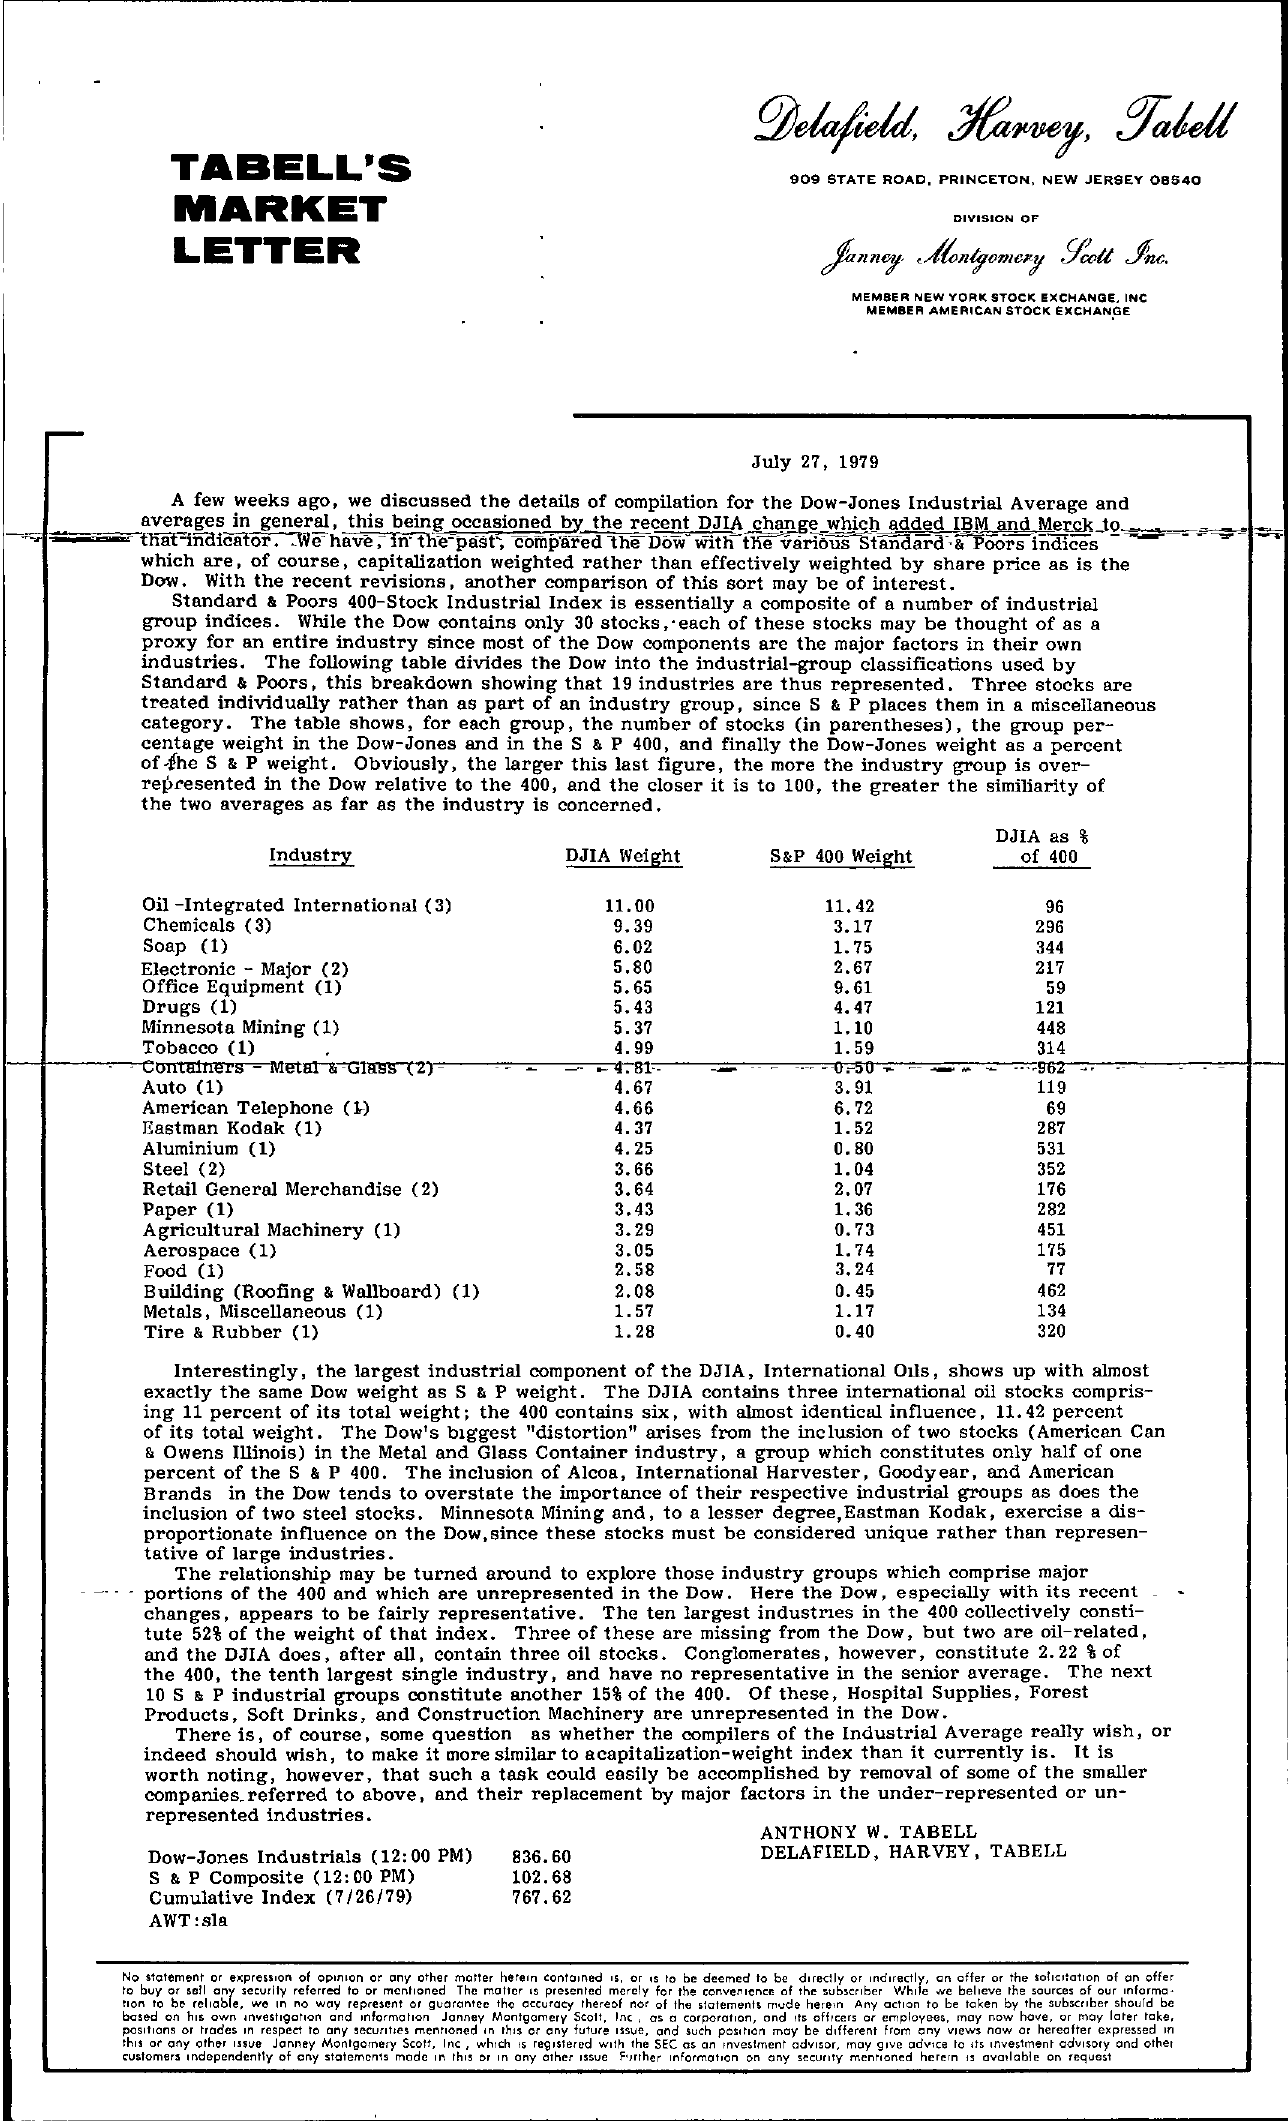 Tabell's Market Letter - July 27, 1979